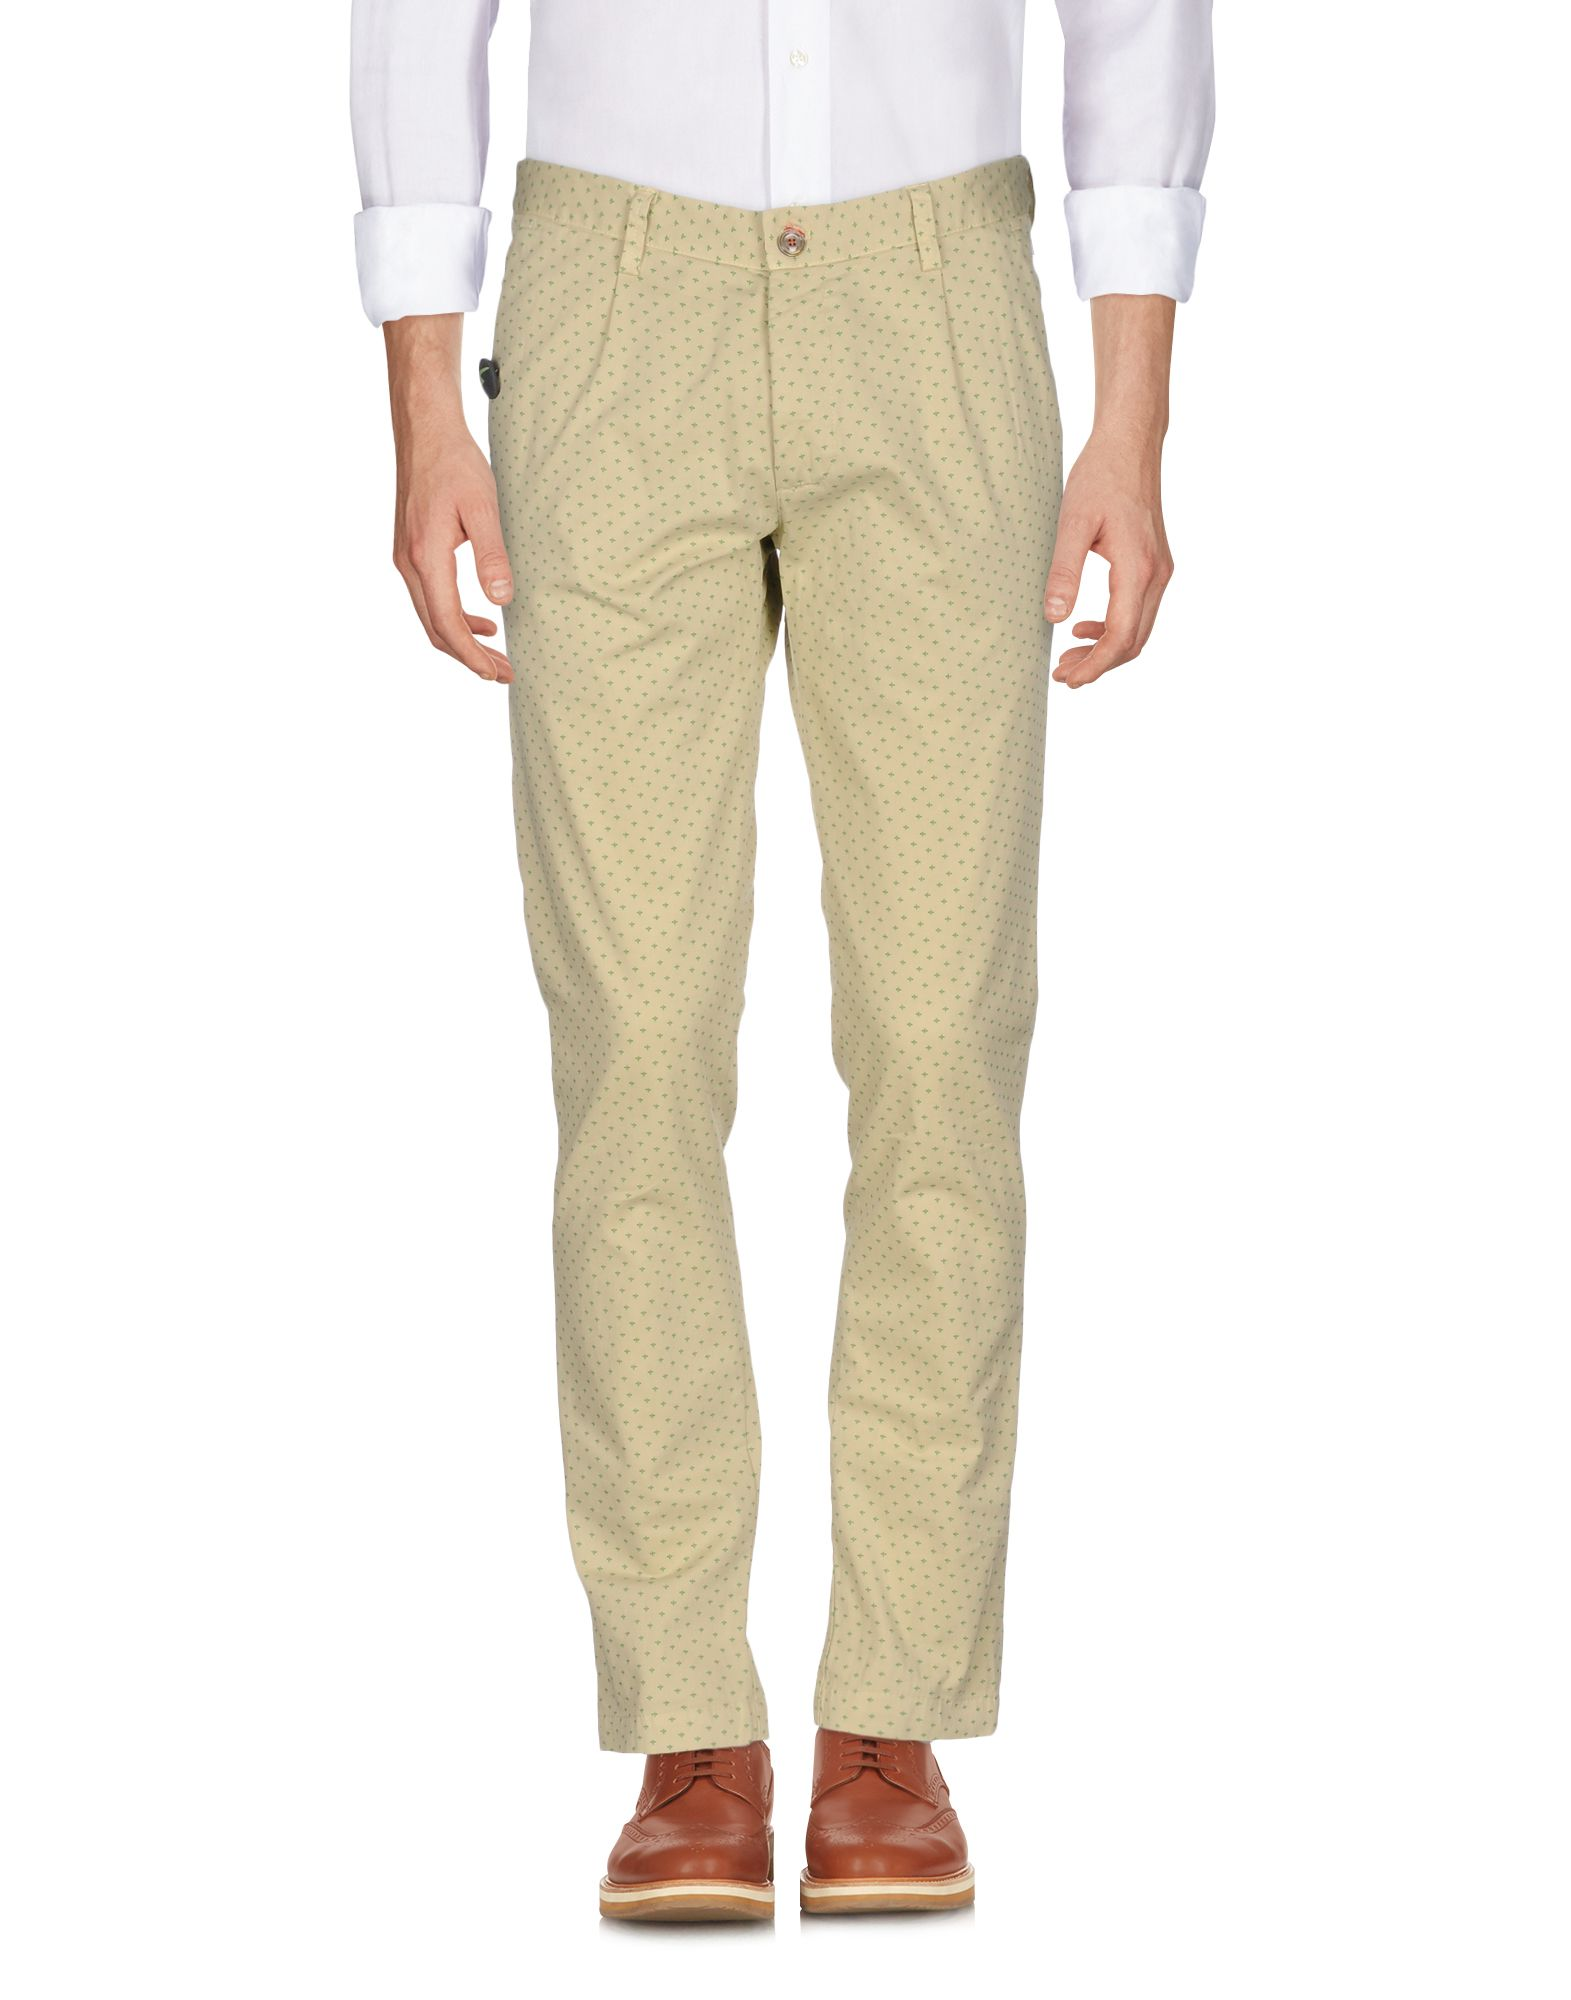 Фото - KOON Повседневные брюки брошь blucome bijouteria esmaltes 7106100495